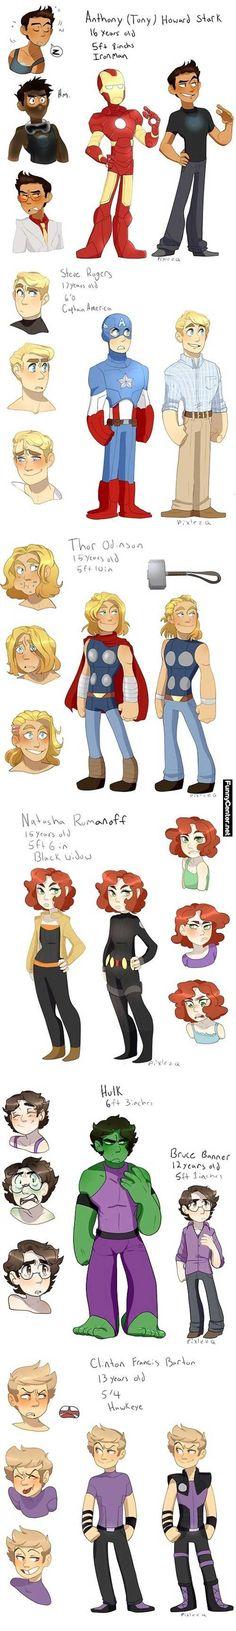 Marvel universe characters as Teenagers #comics #avengers